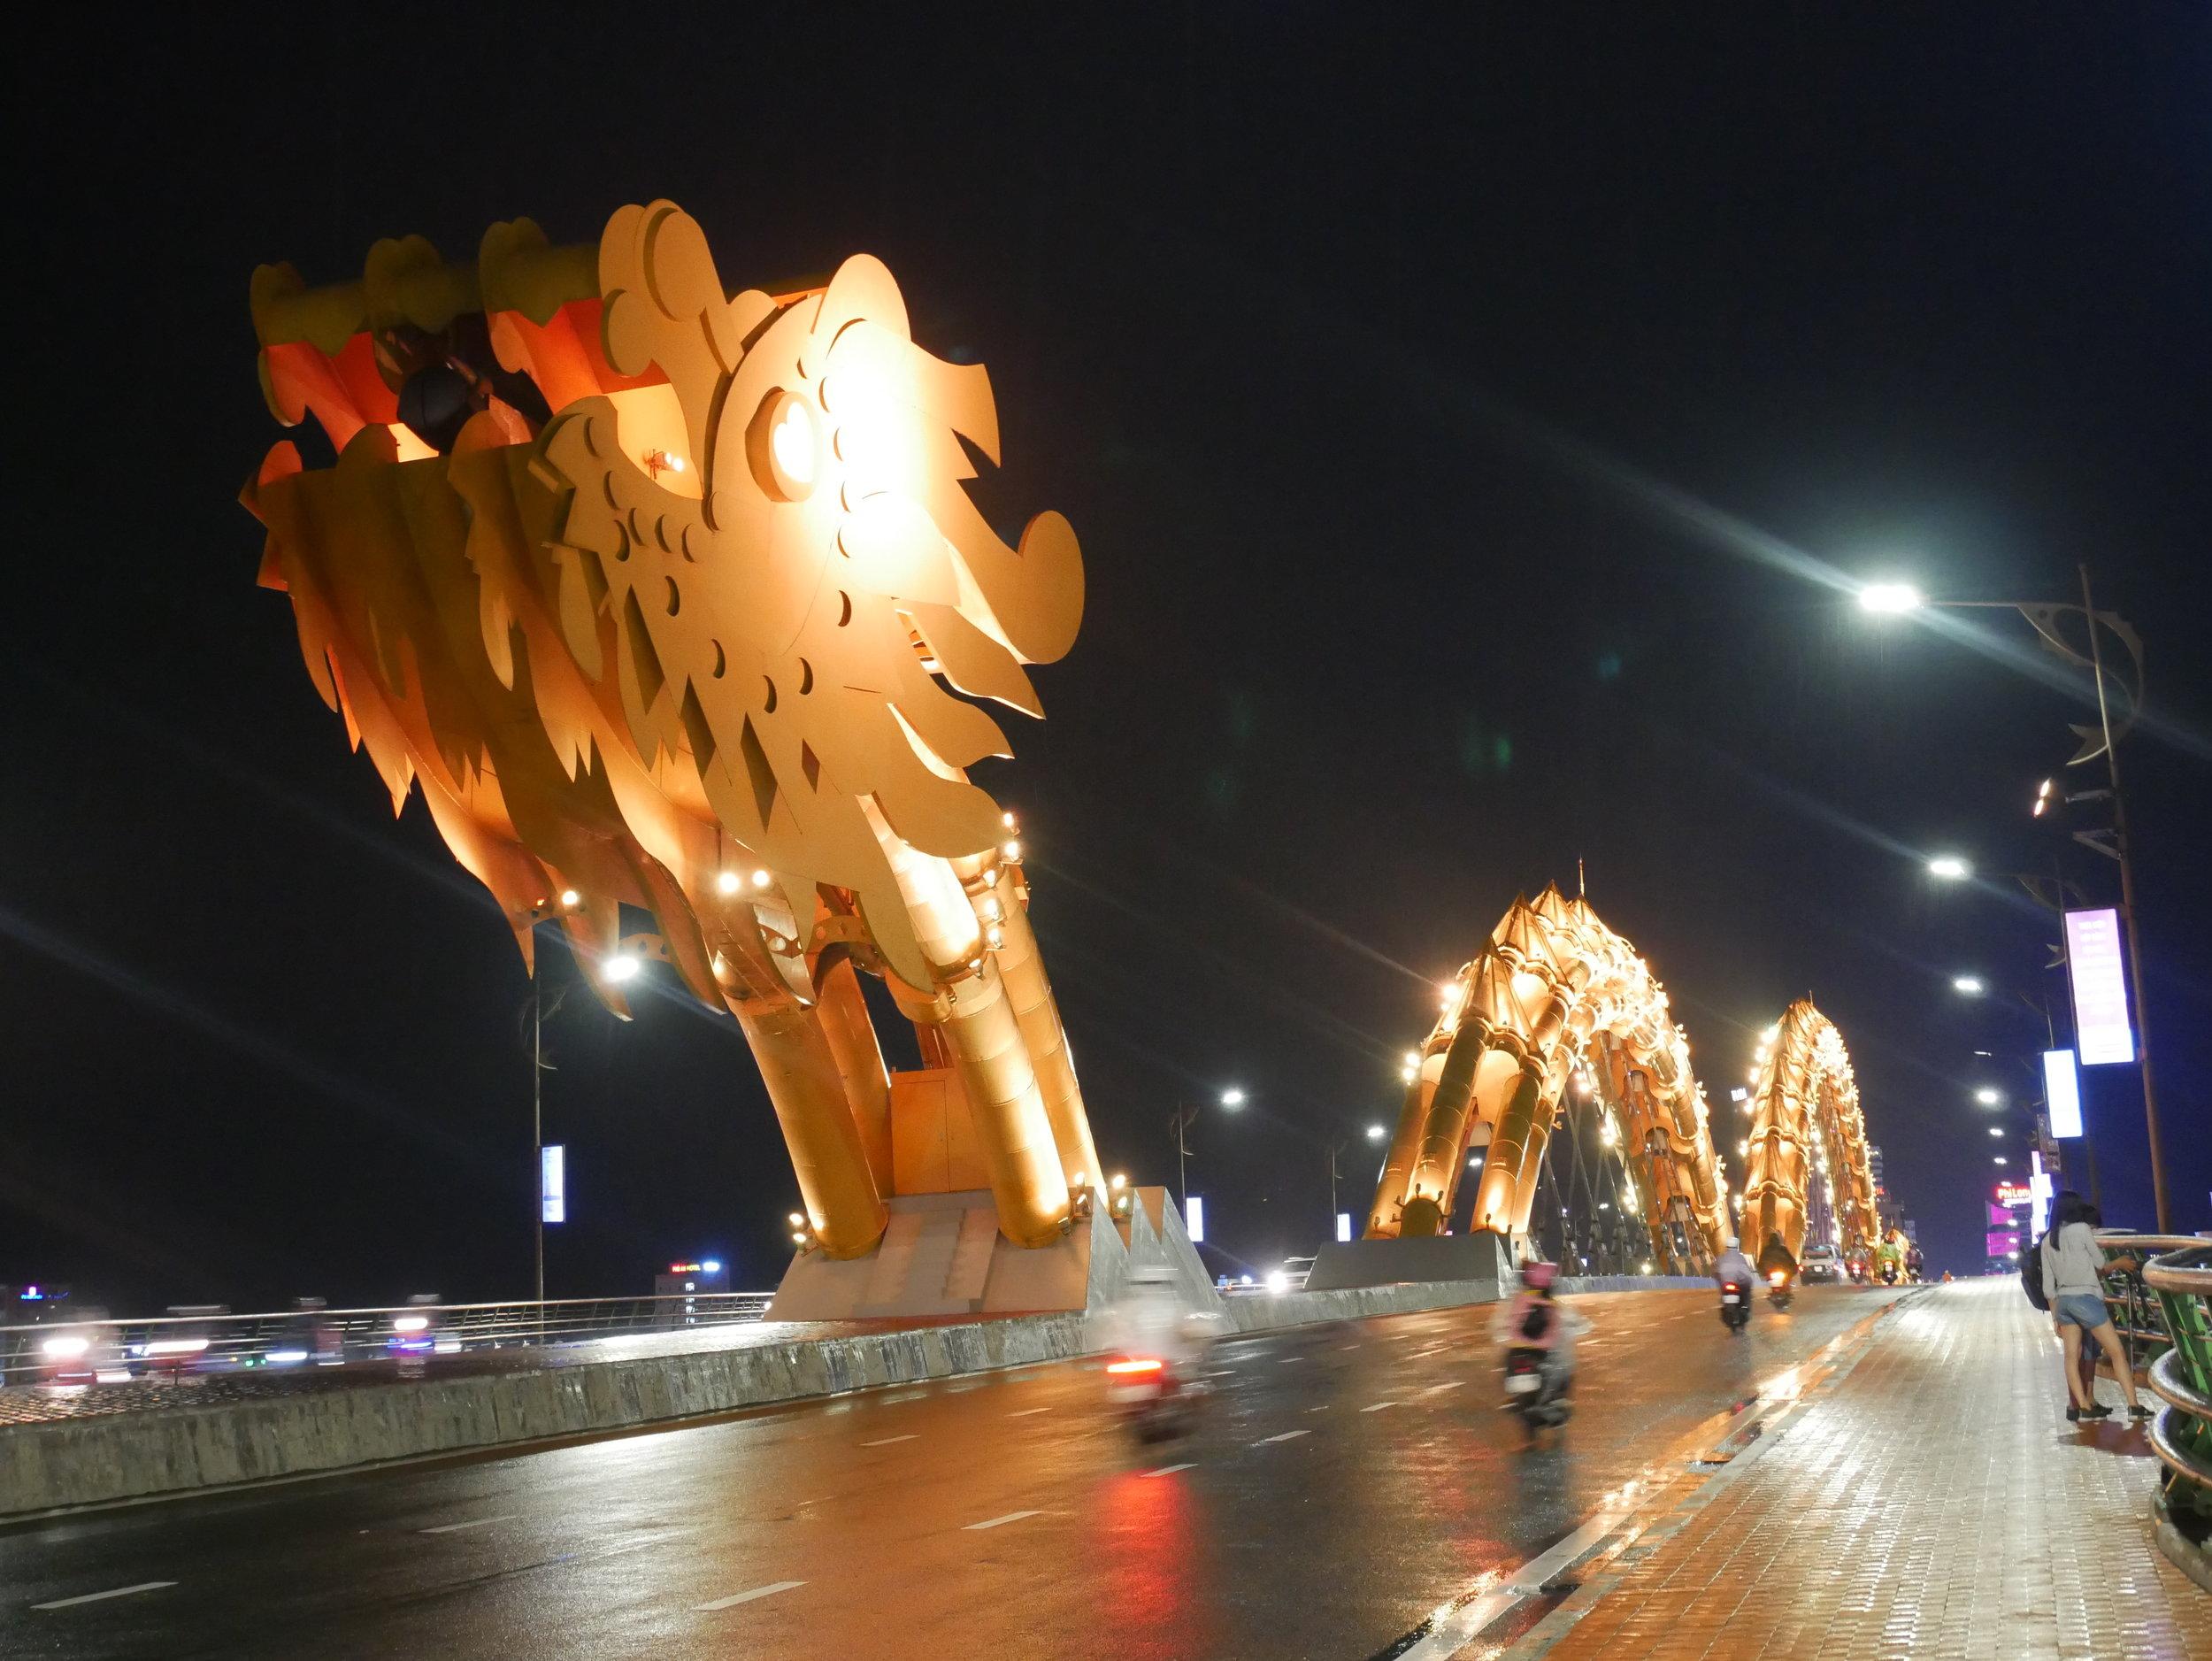 Dragon Bridge at night - every night this bridge shoots fire!